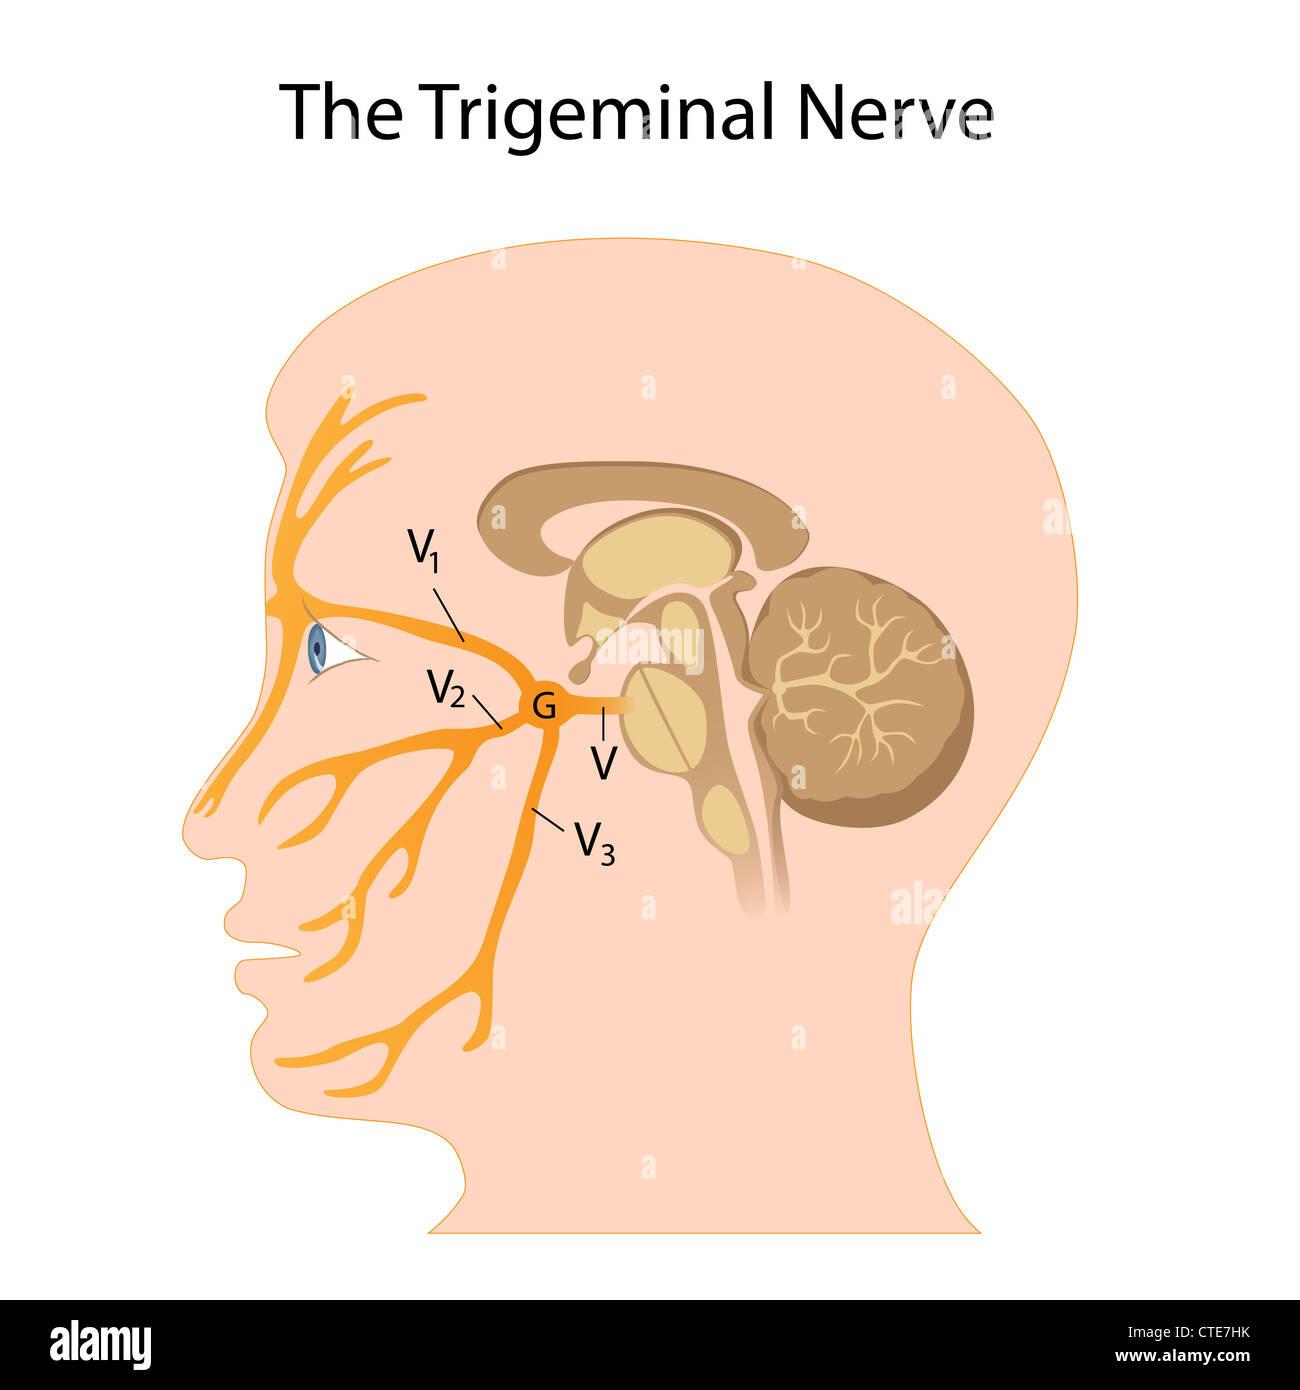 The trigeminal nerve Stock Photo: 49485791 - Alamy